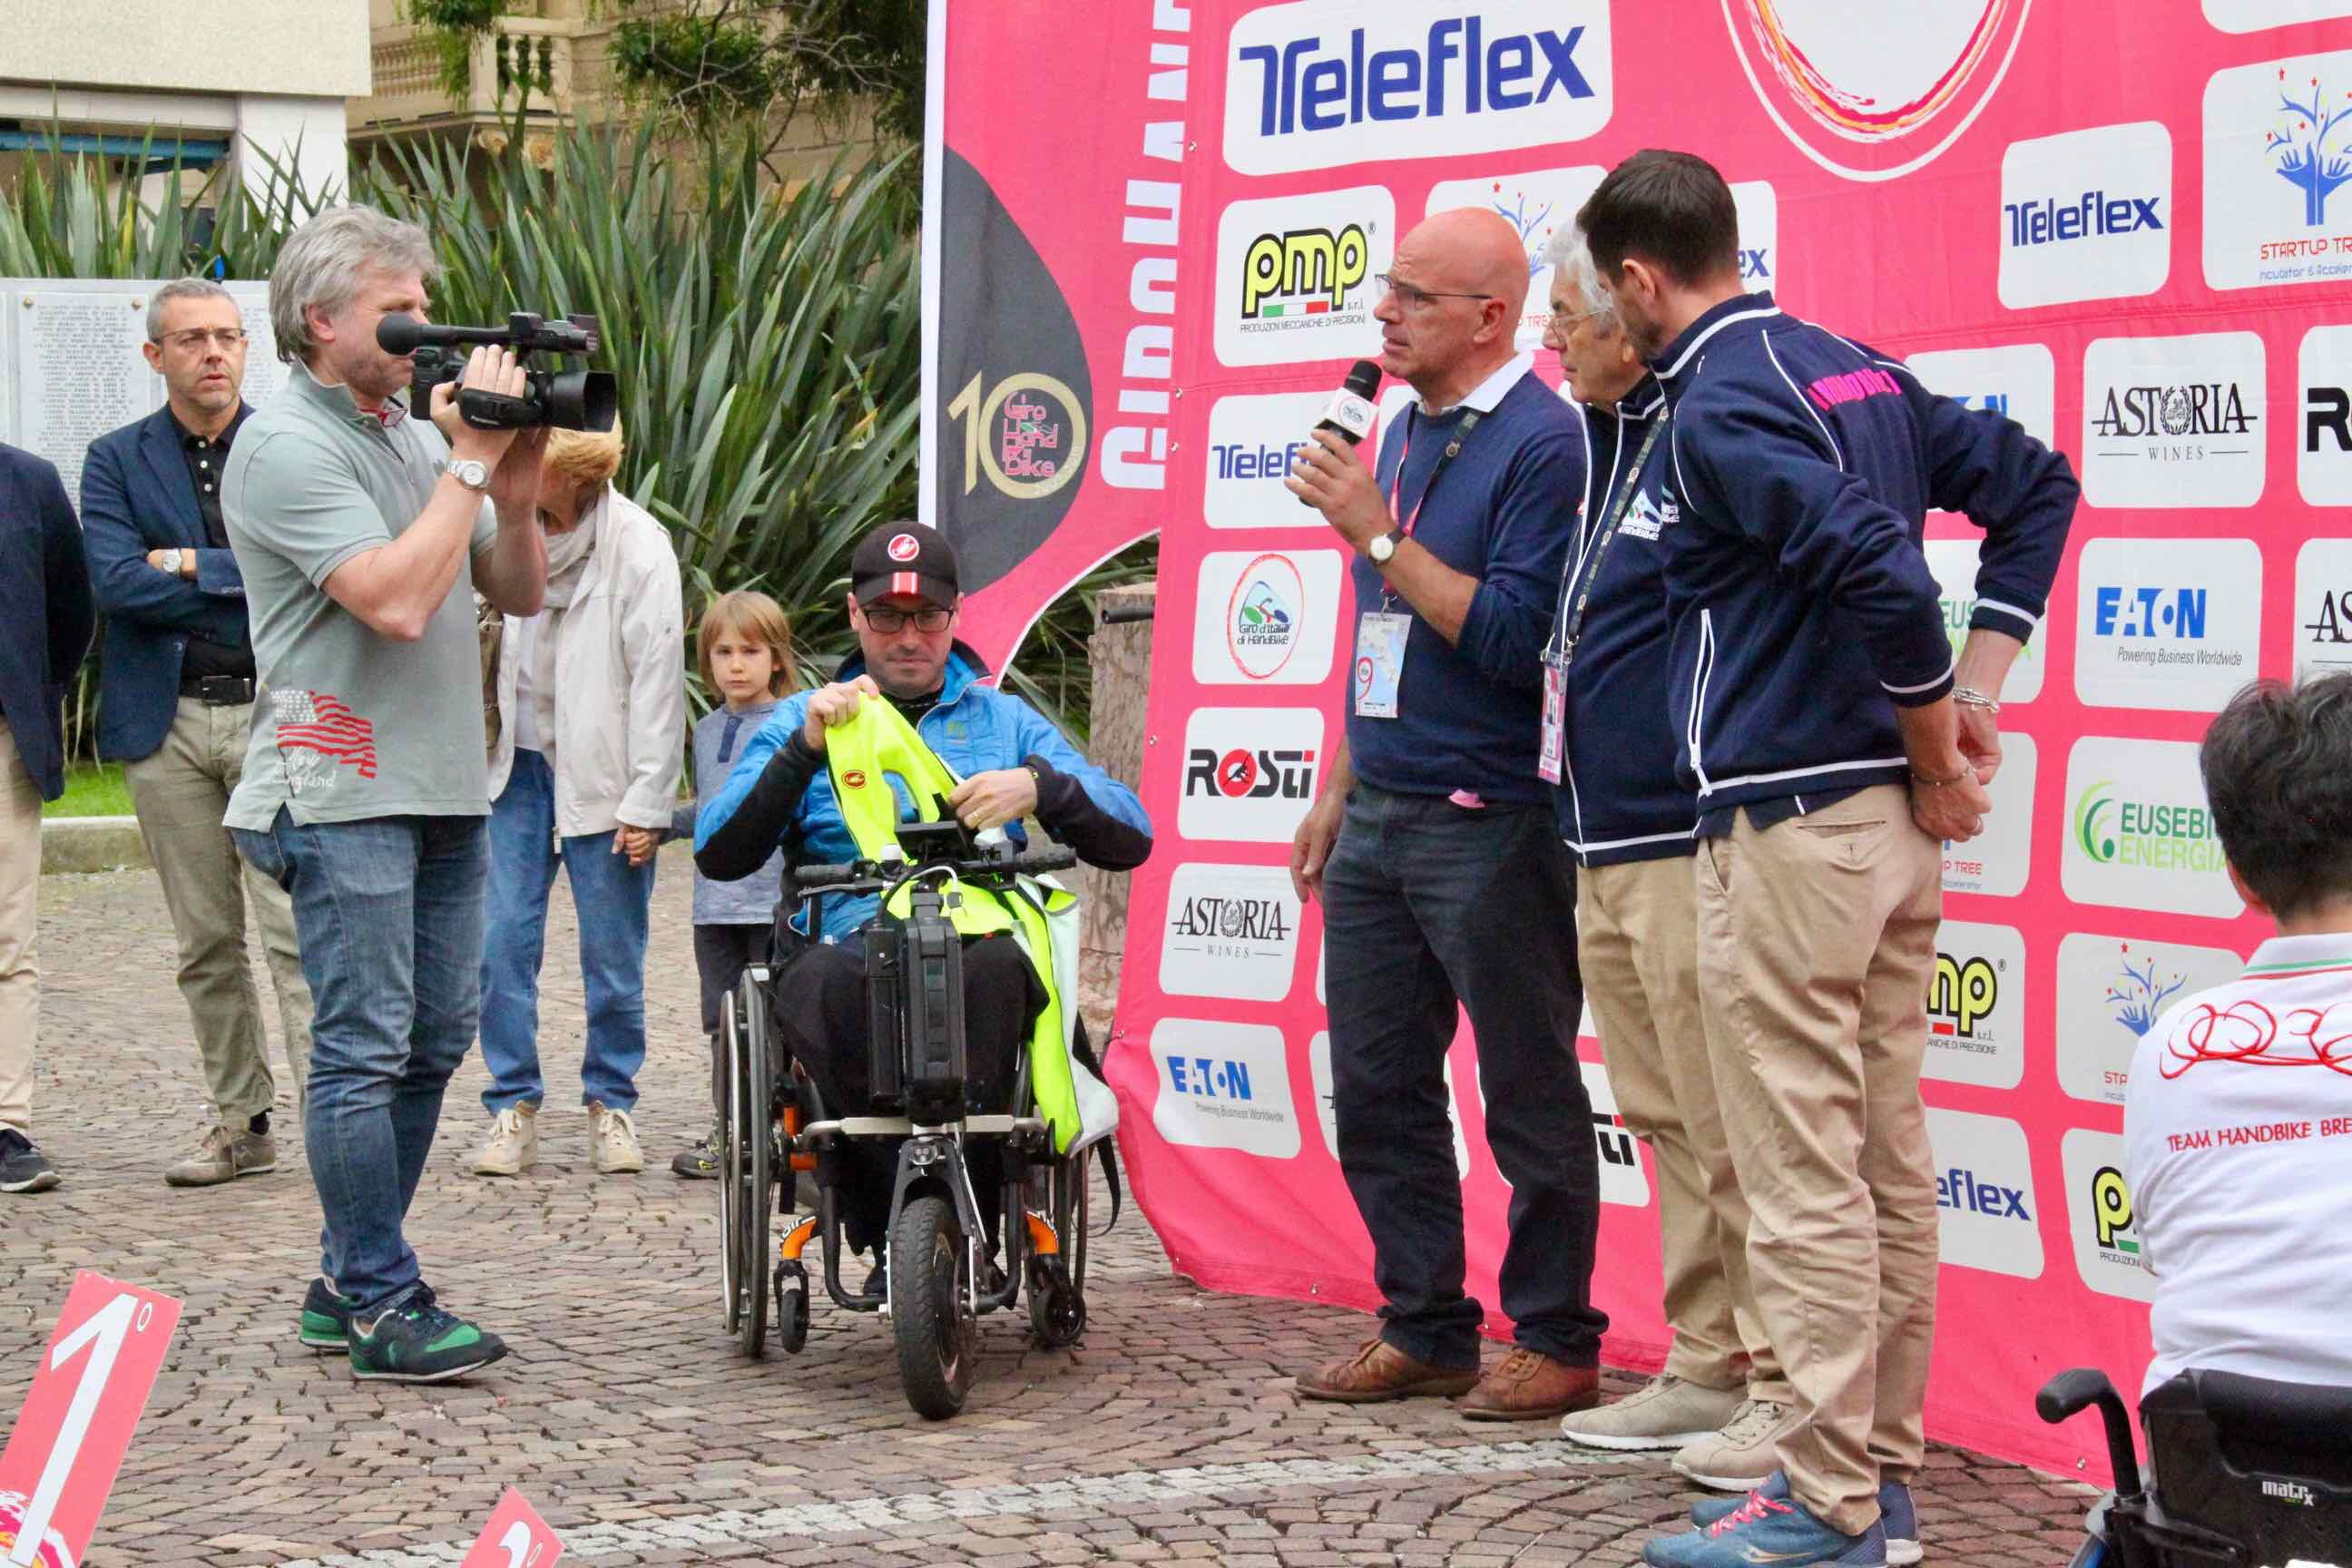 1° Memorial don Nando Negri a Chiavari per il Giro d'Italia Handbike 2018 - 16